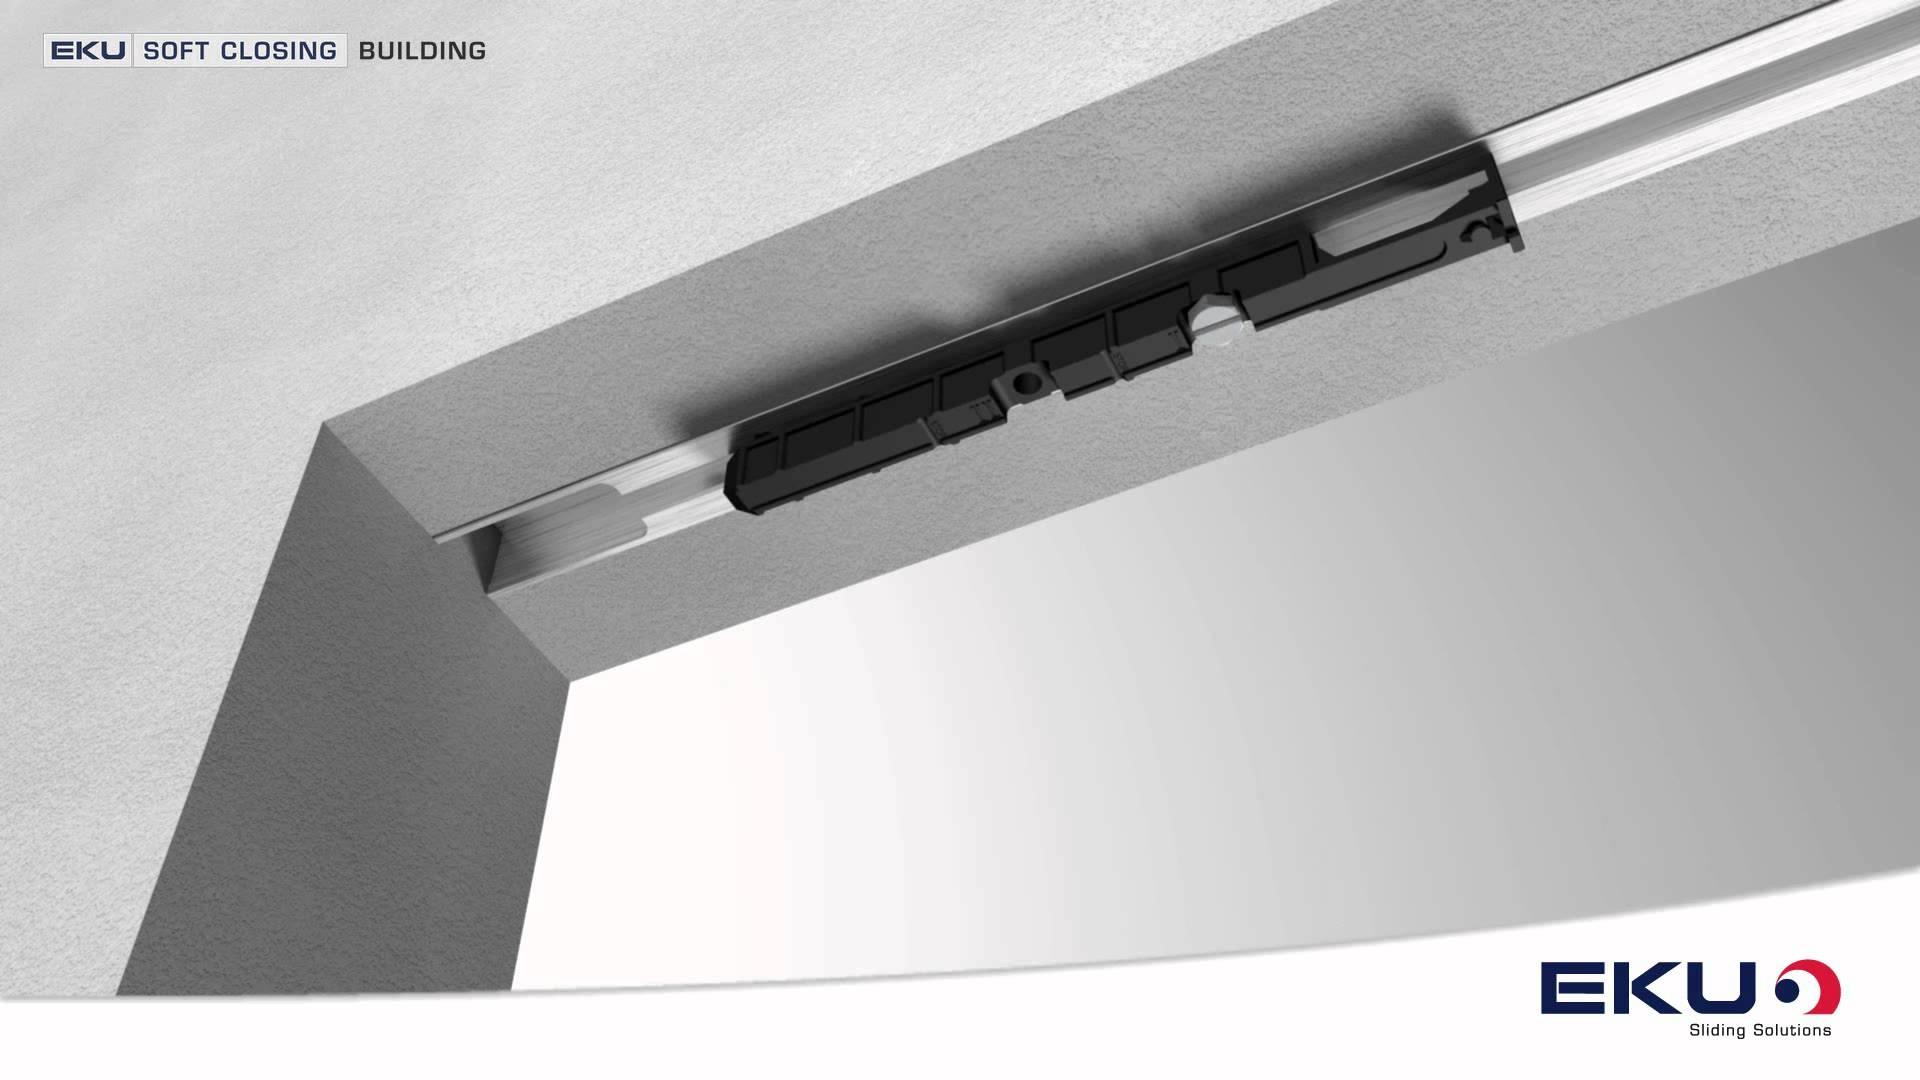 Hafele Sliding Glass Door Systemshafele installation guide soft closing sliding hardware eku